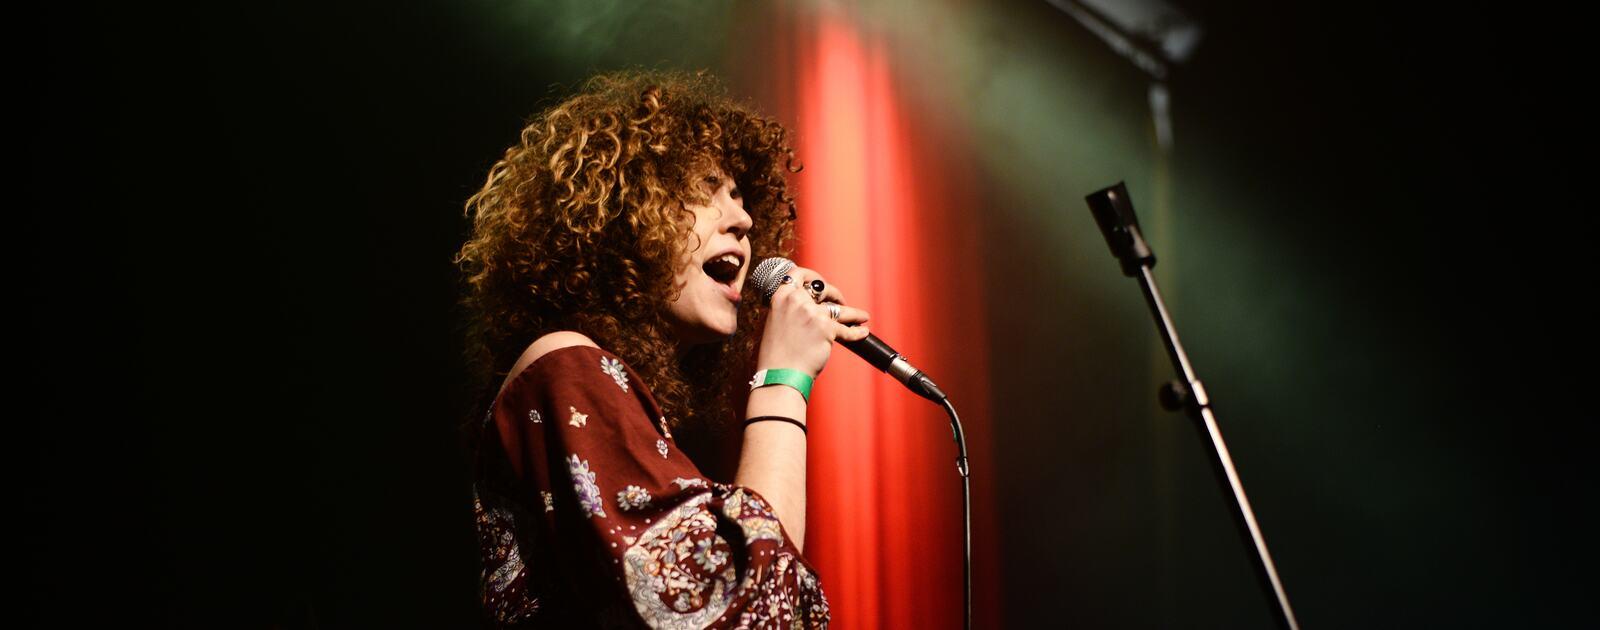 Clara Serra López, singer